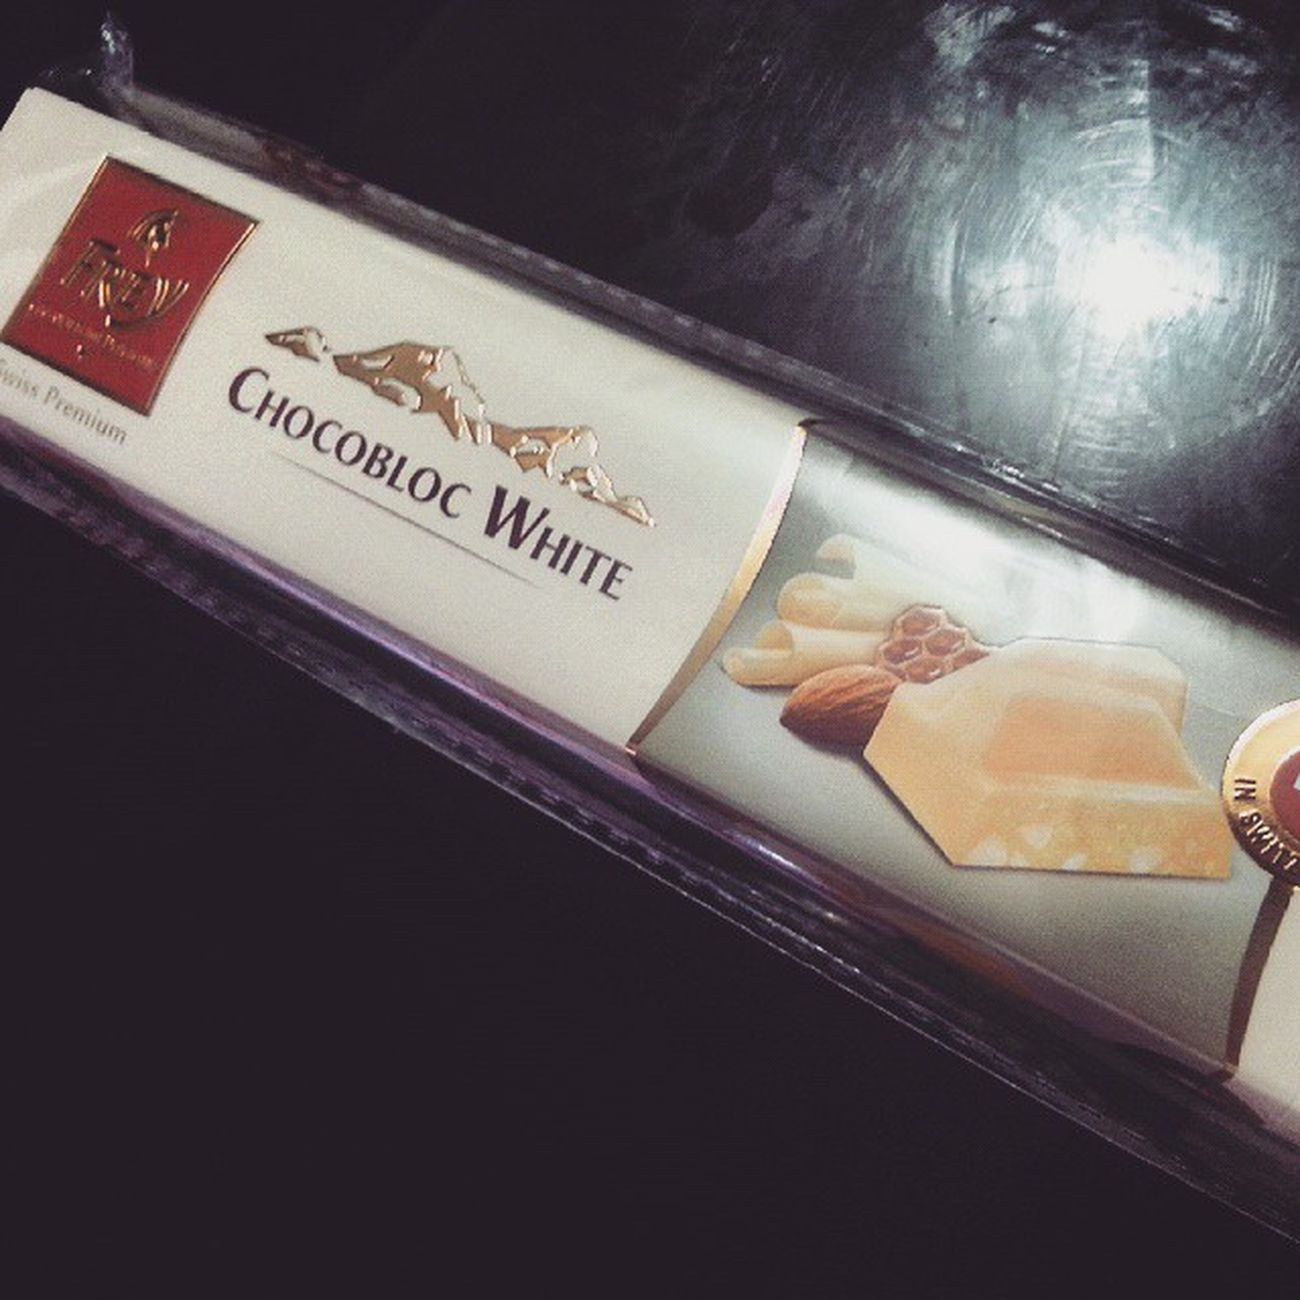 Chocolate...Thank you kuya:) Bimbyjames so sweet♥♥♥ nman..... love you kuya!!! happy valentine's day to everyone!!!